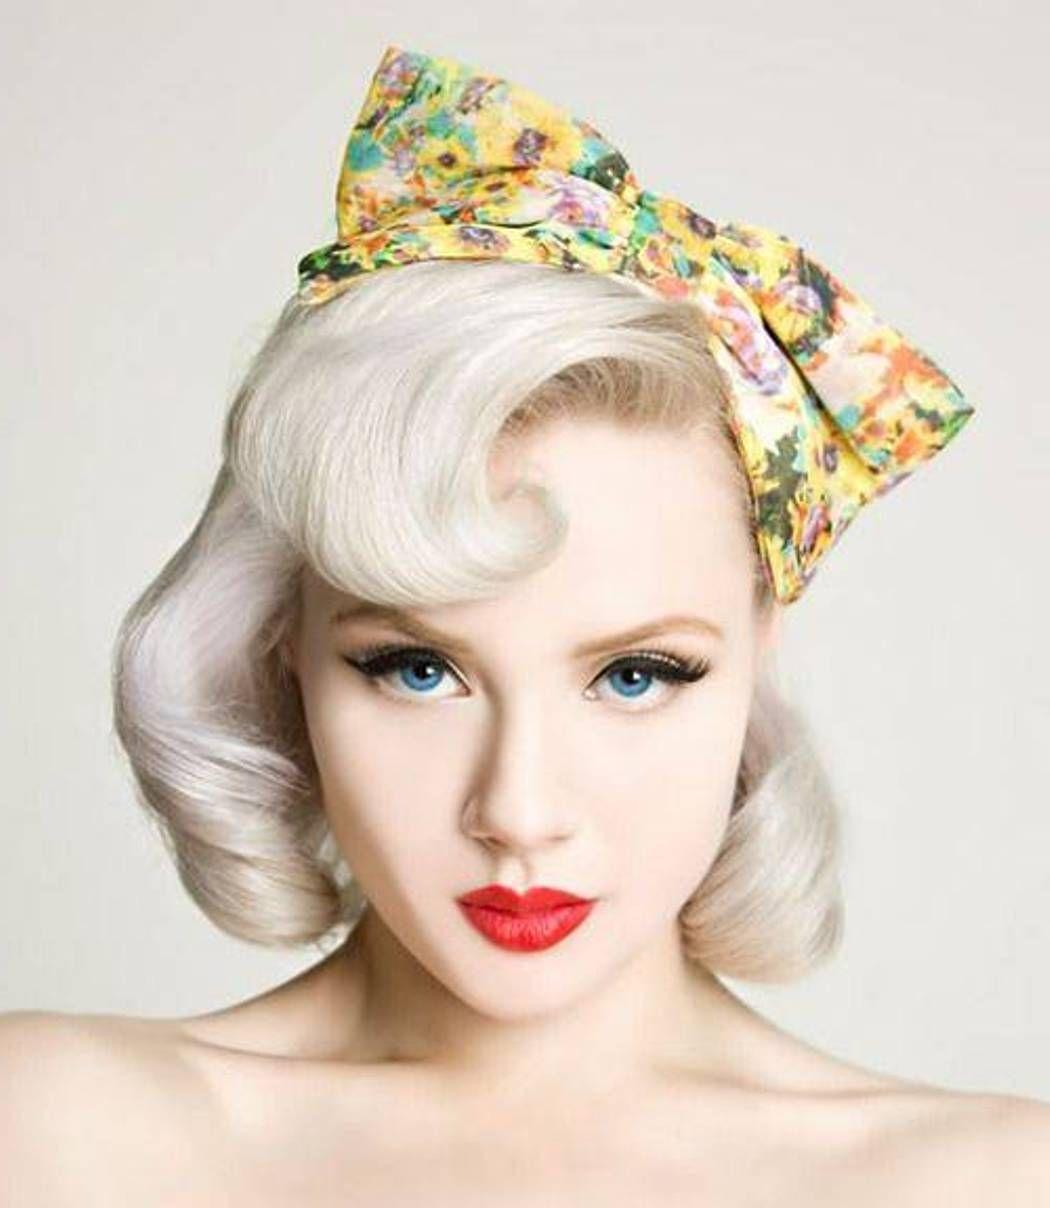 Awe Inspiring 1000 Images About Rockabilly Pin Up On Pinterest Pin Up Short Hairstyles Gunalazisus